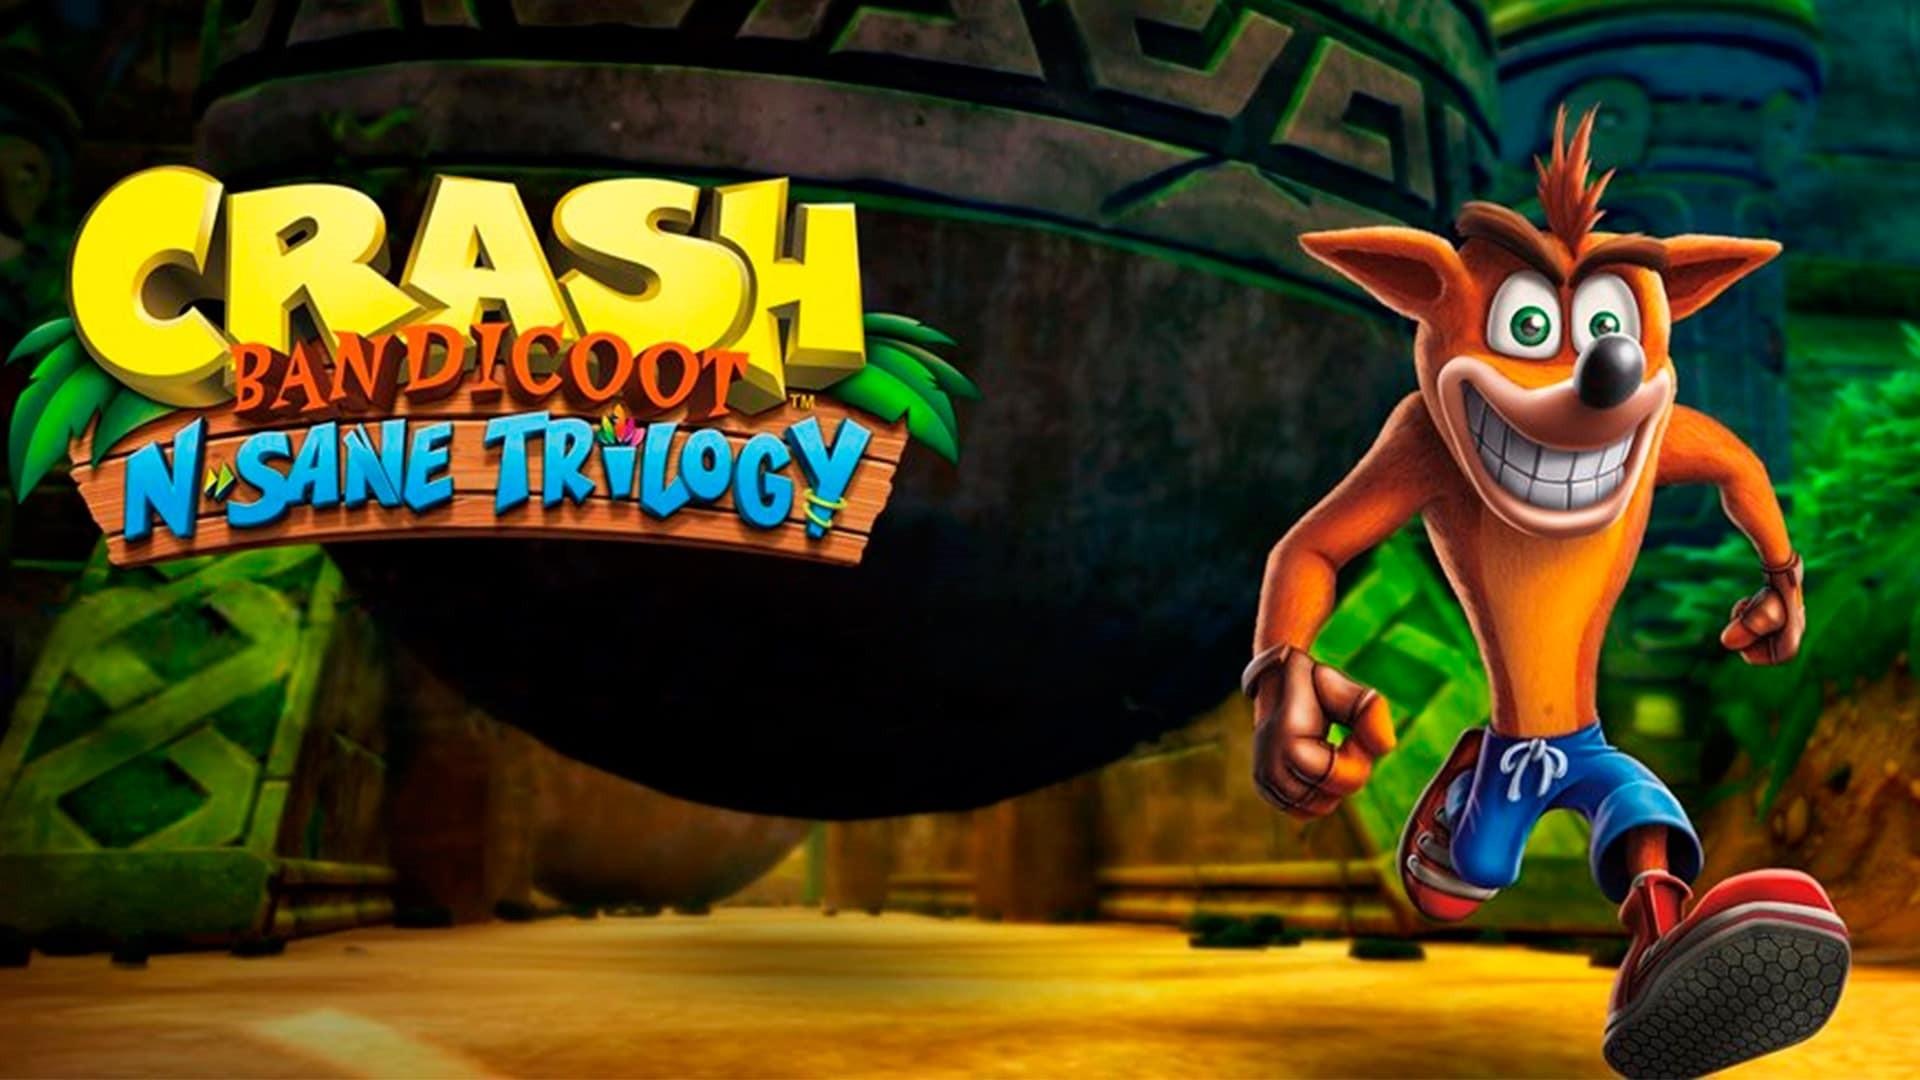 Crash Bandicoot Free Wallpaper and Background